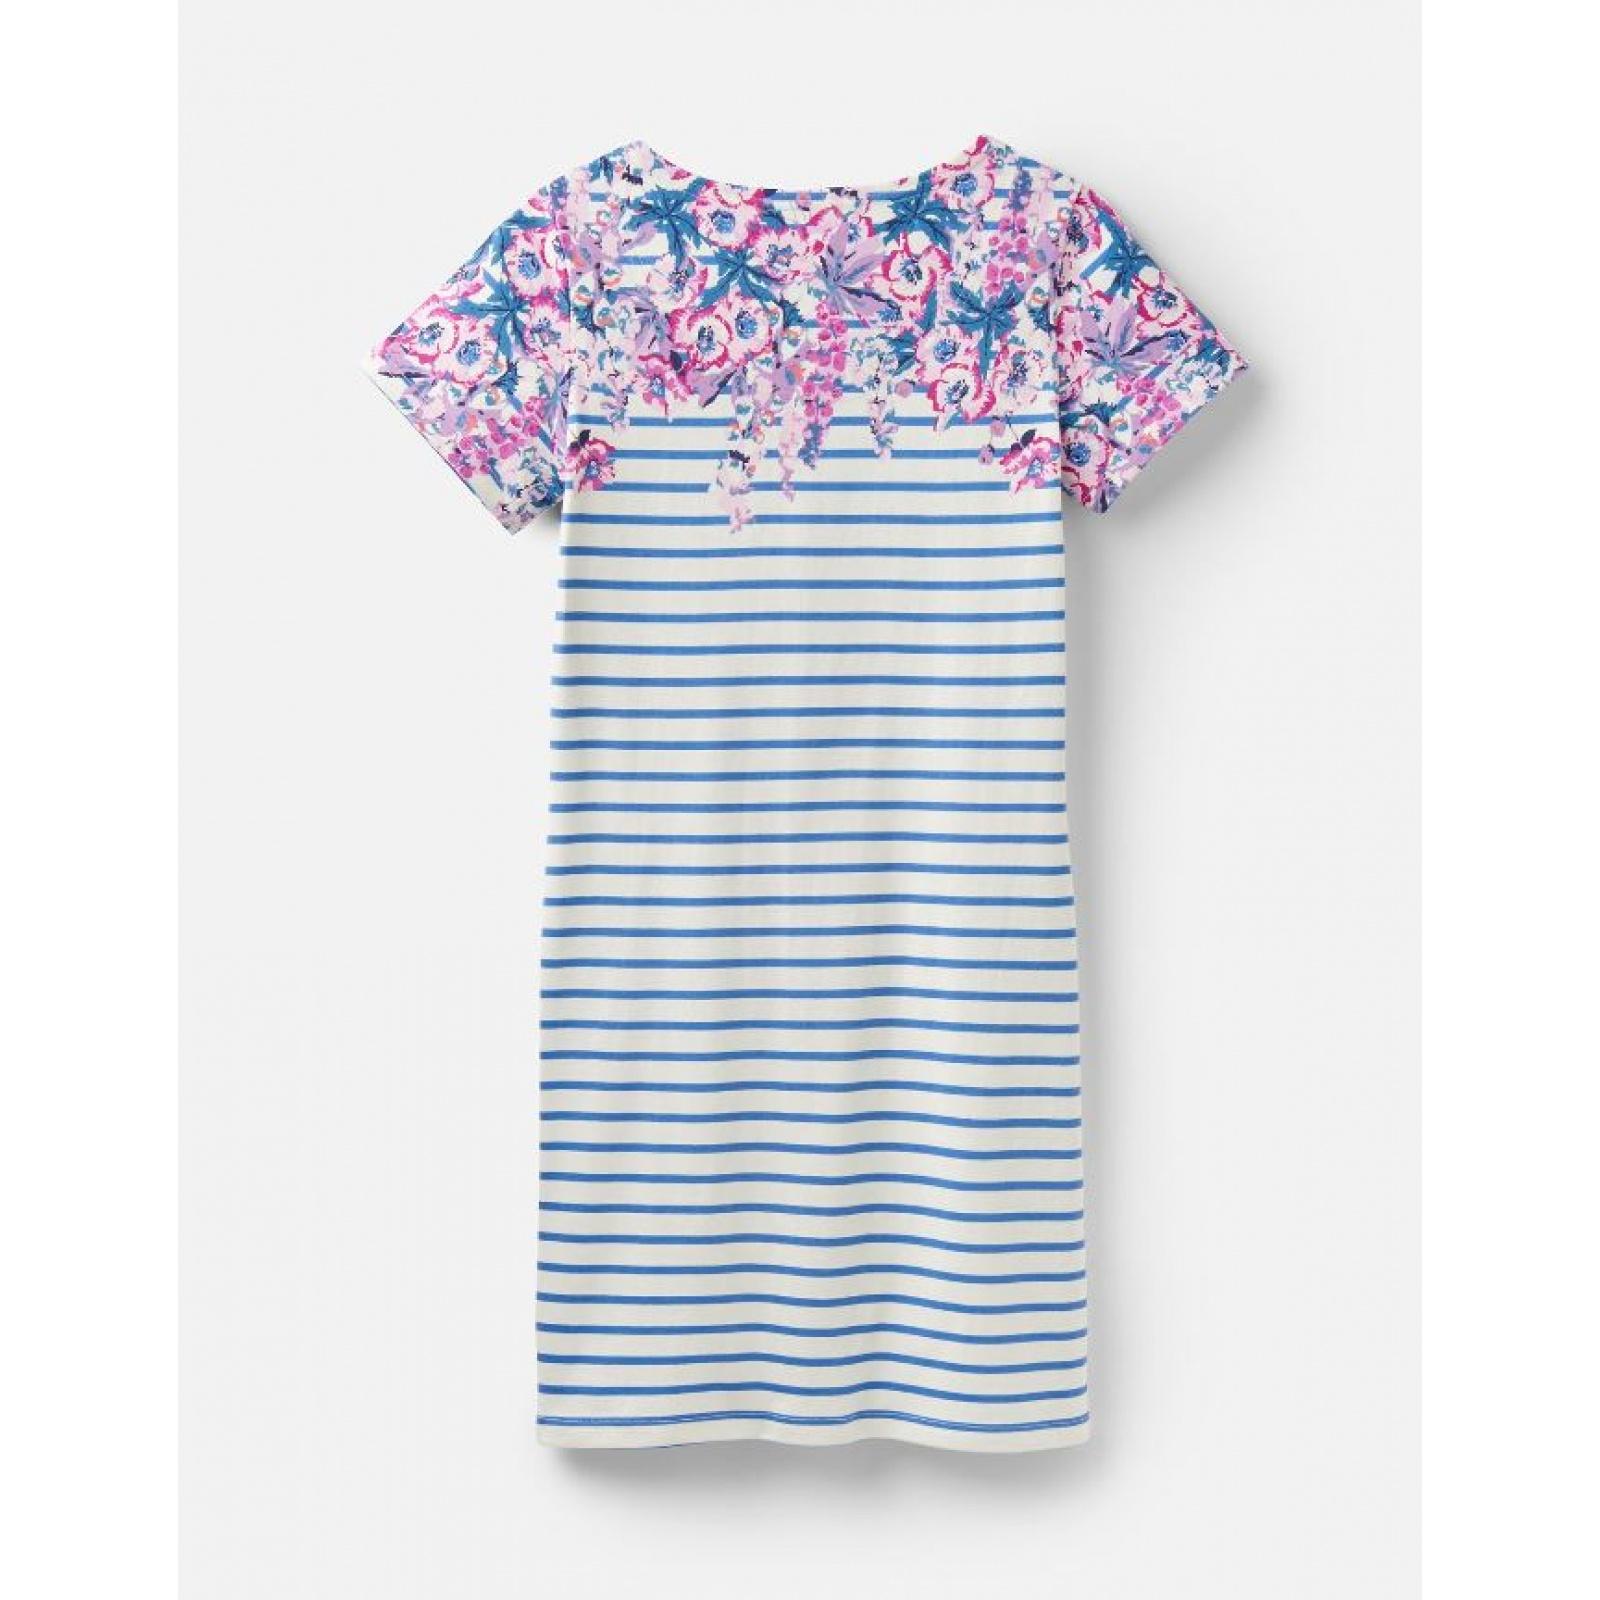 Joules-Riviera-Print-T-Shirt-Dress-with-Short-Sleeves-SS19 thumbnail 4